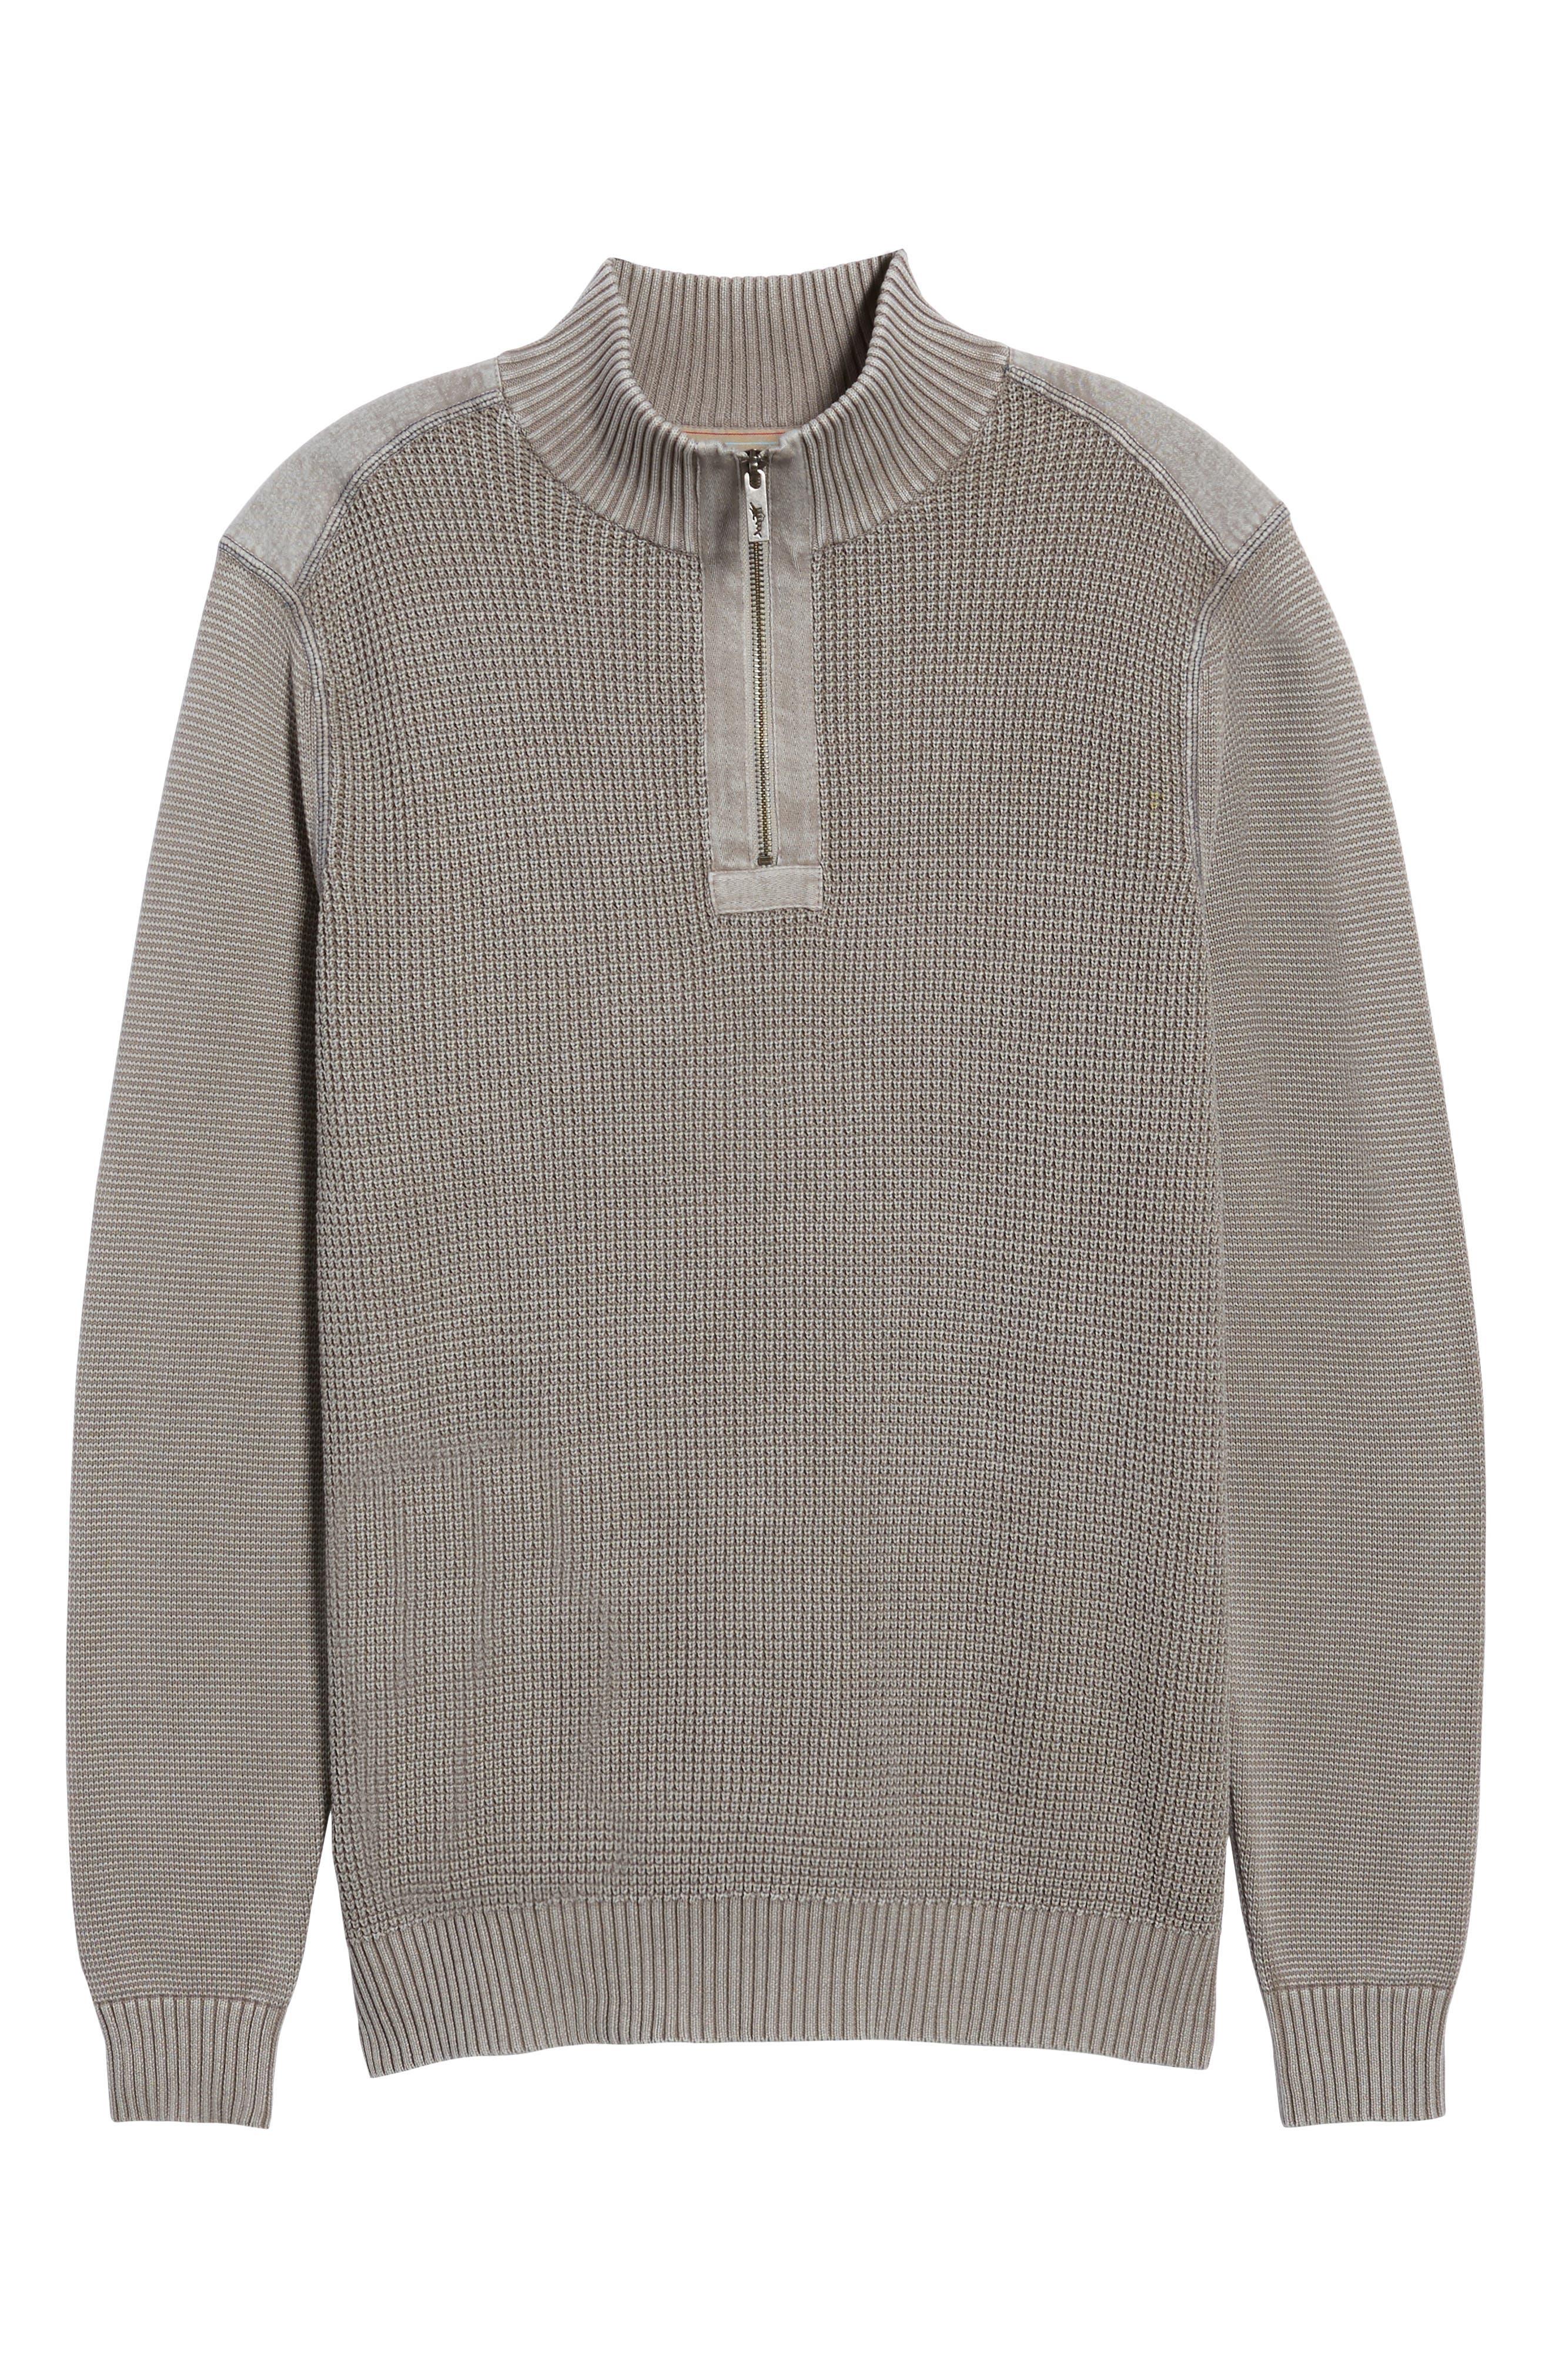 Coastal Shores Quarter Zip Sweater,                             Alternate thumbnail 4, color,                             Pebble Grey